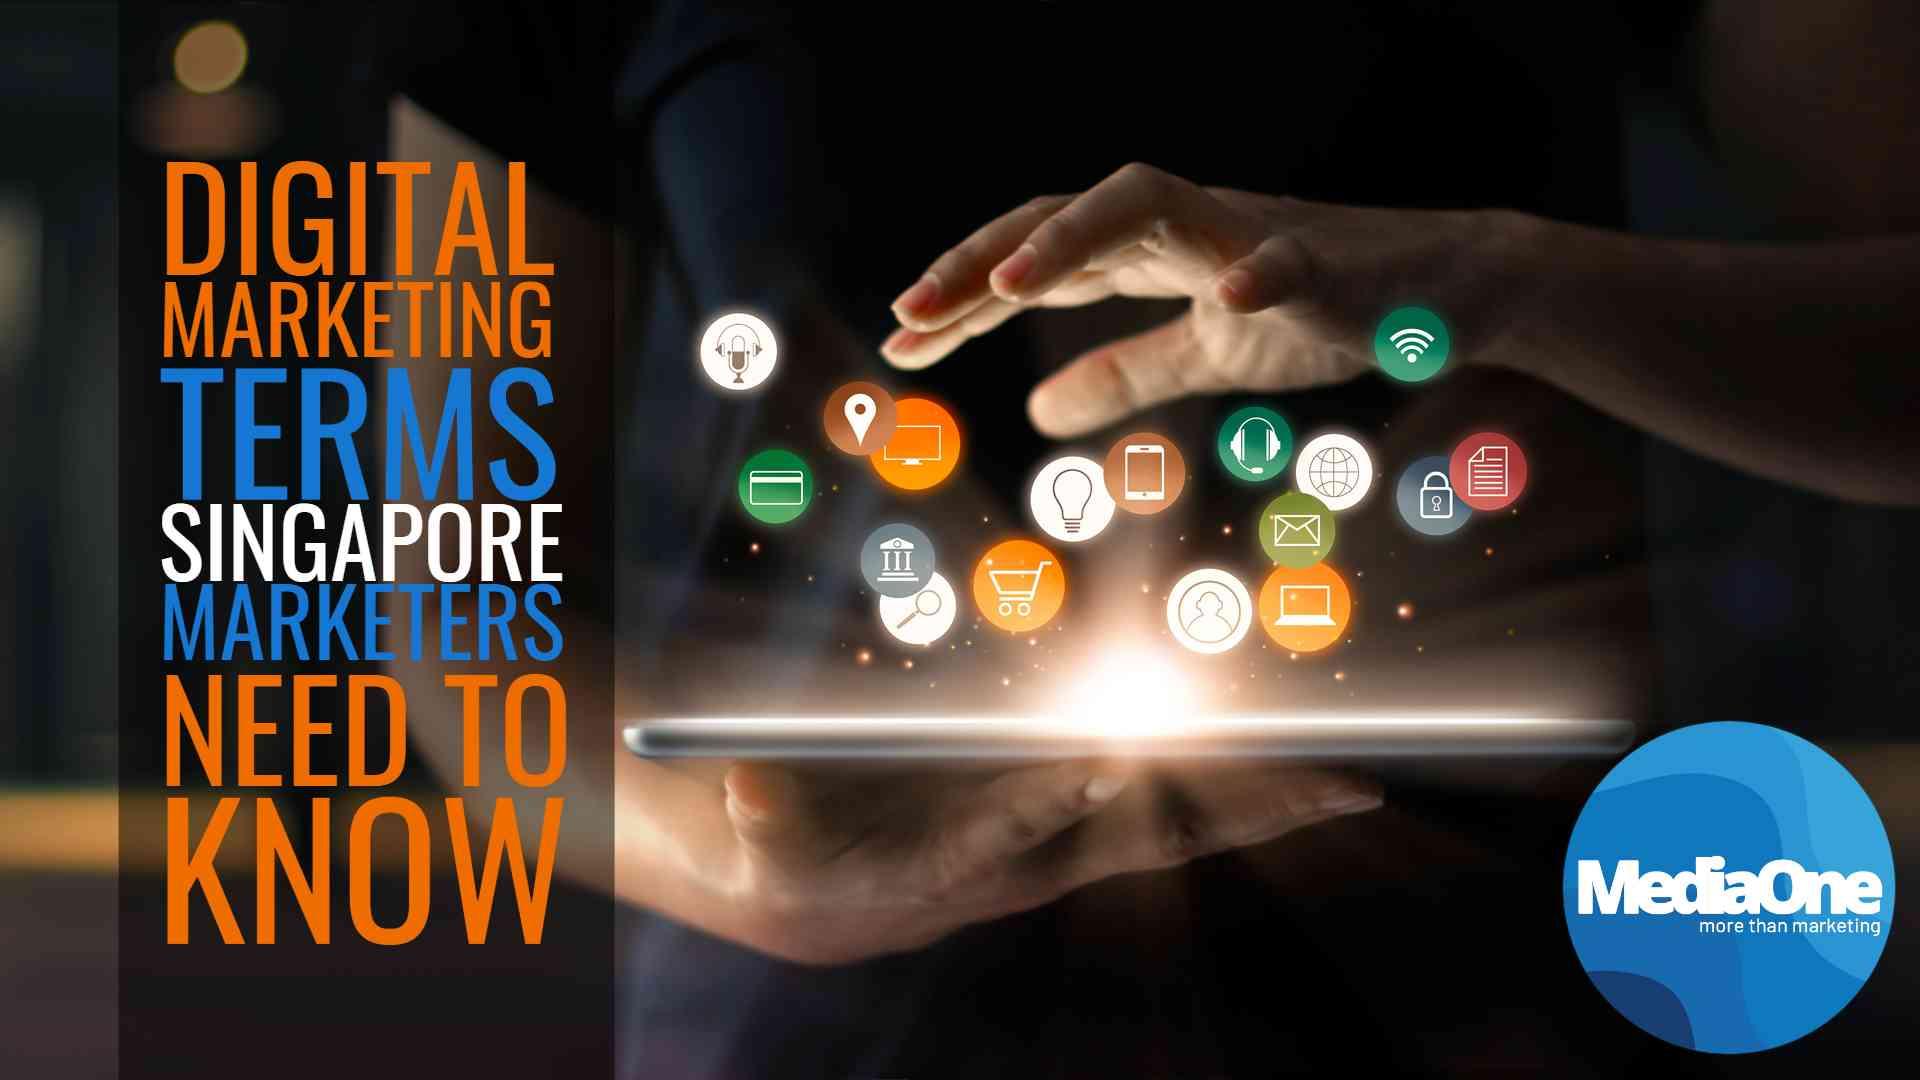 digital-marketing-terms-singapore-marketer-need-to-know